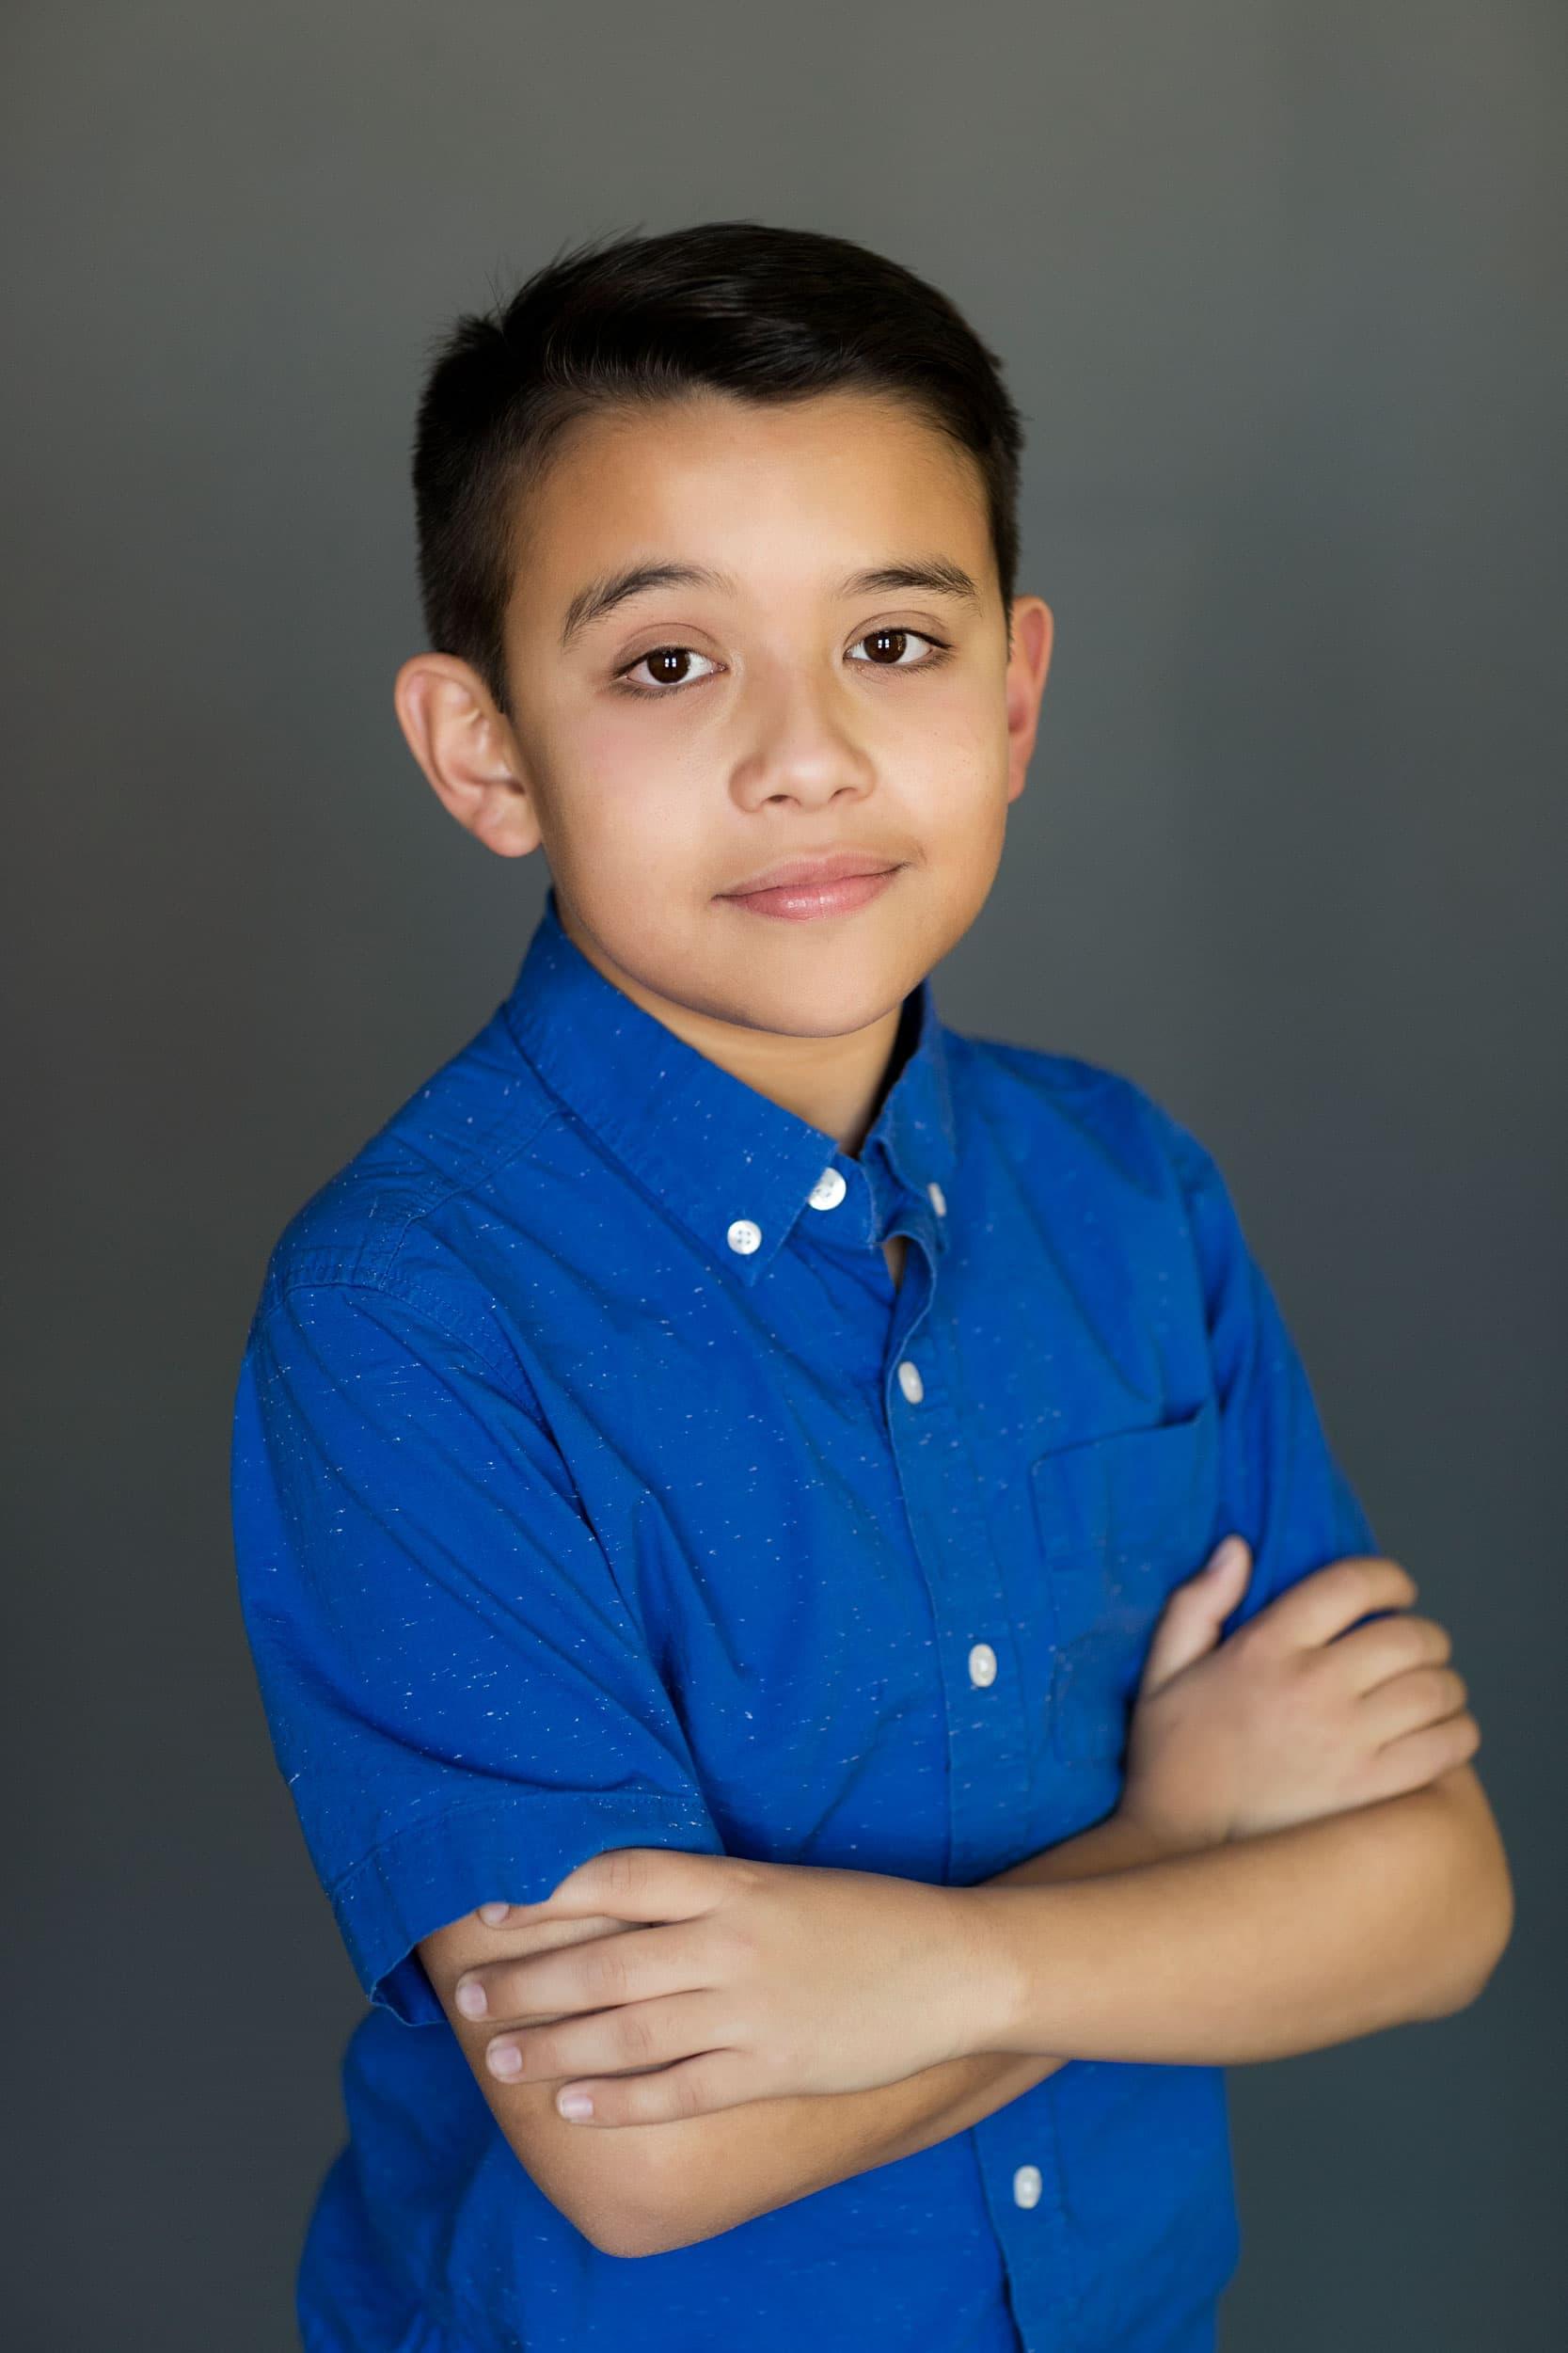 modeling portfolio photo of kid